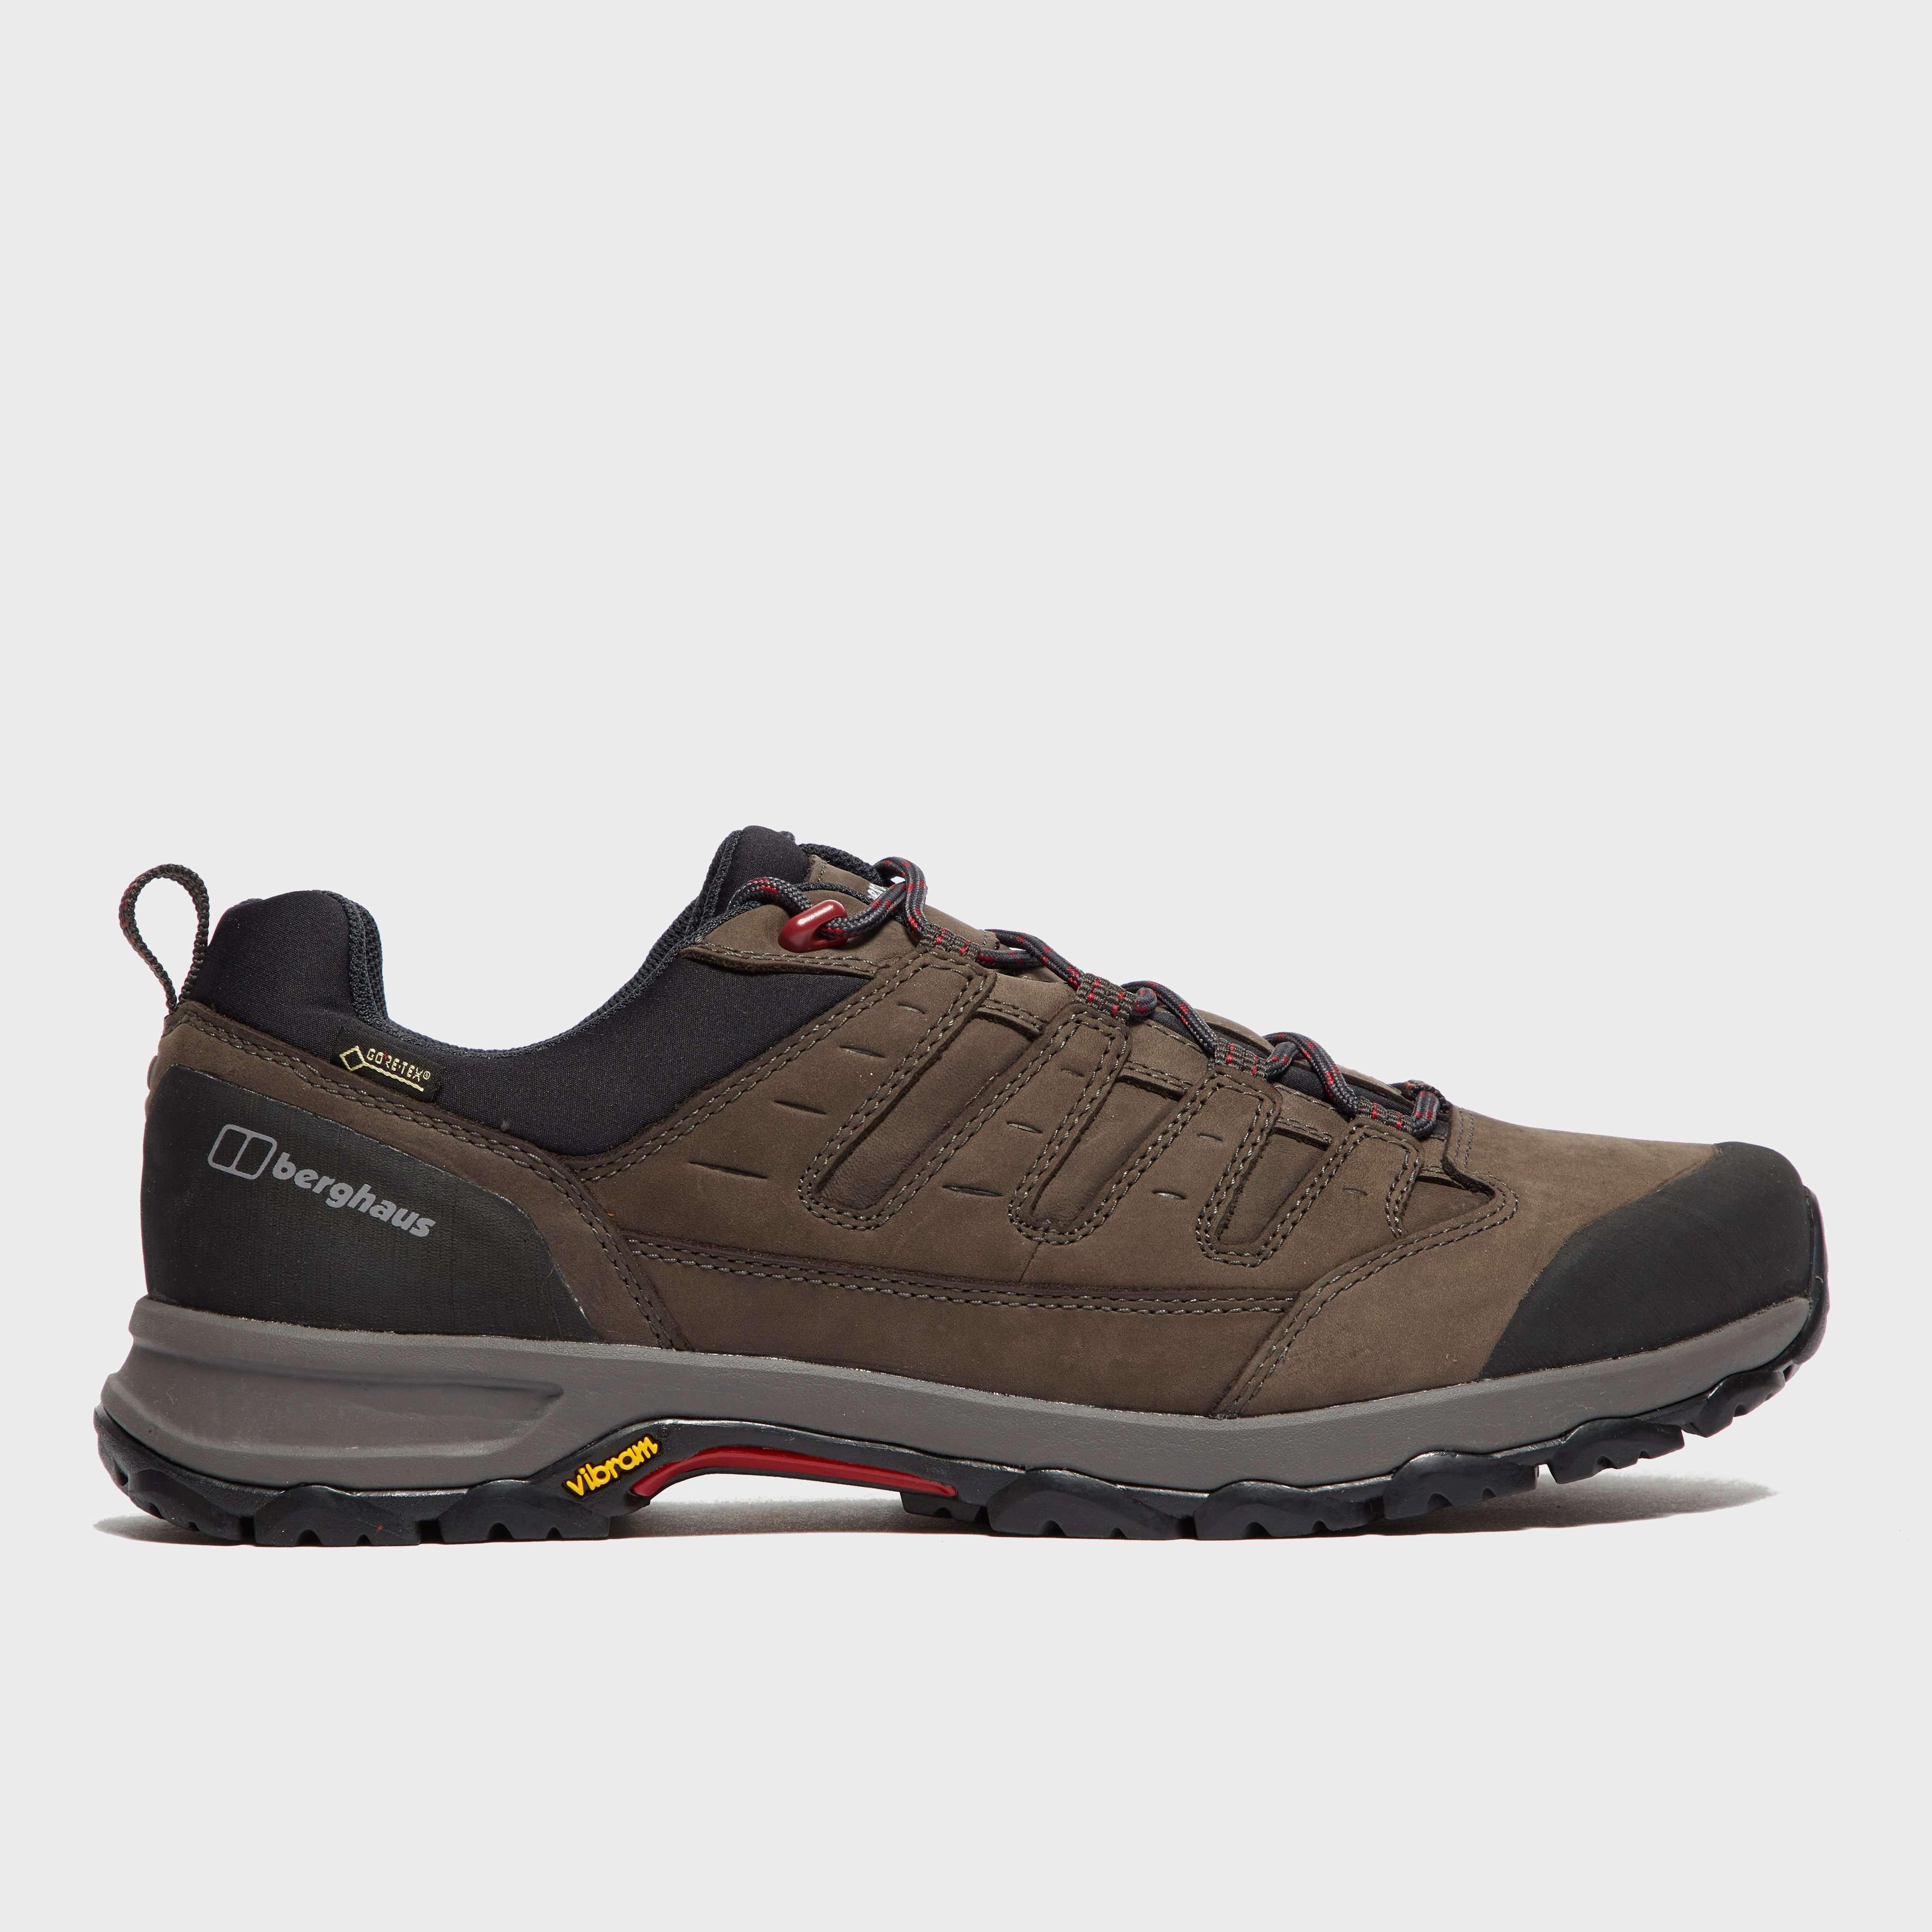 BERGHAUS Men's Fellmaster Active GORE-TEX® Shoes